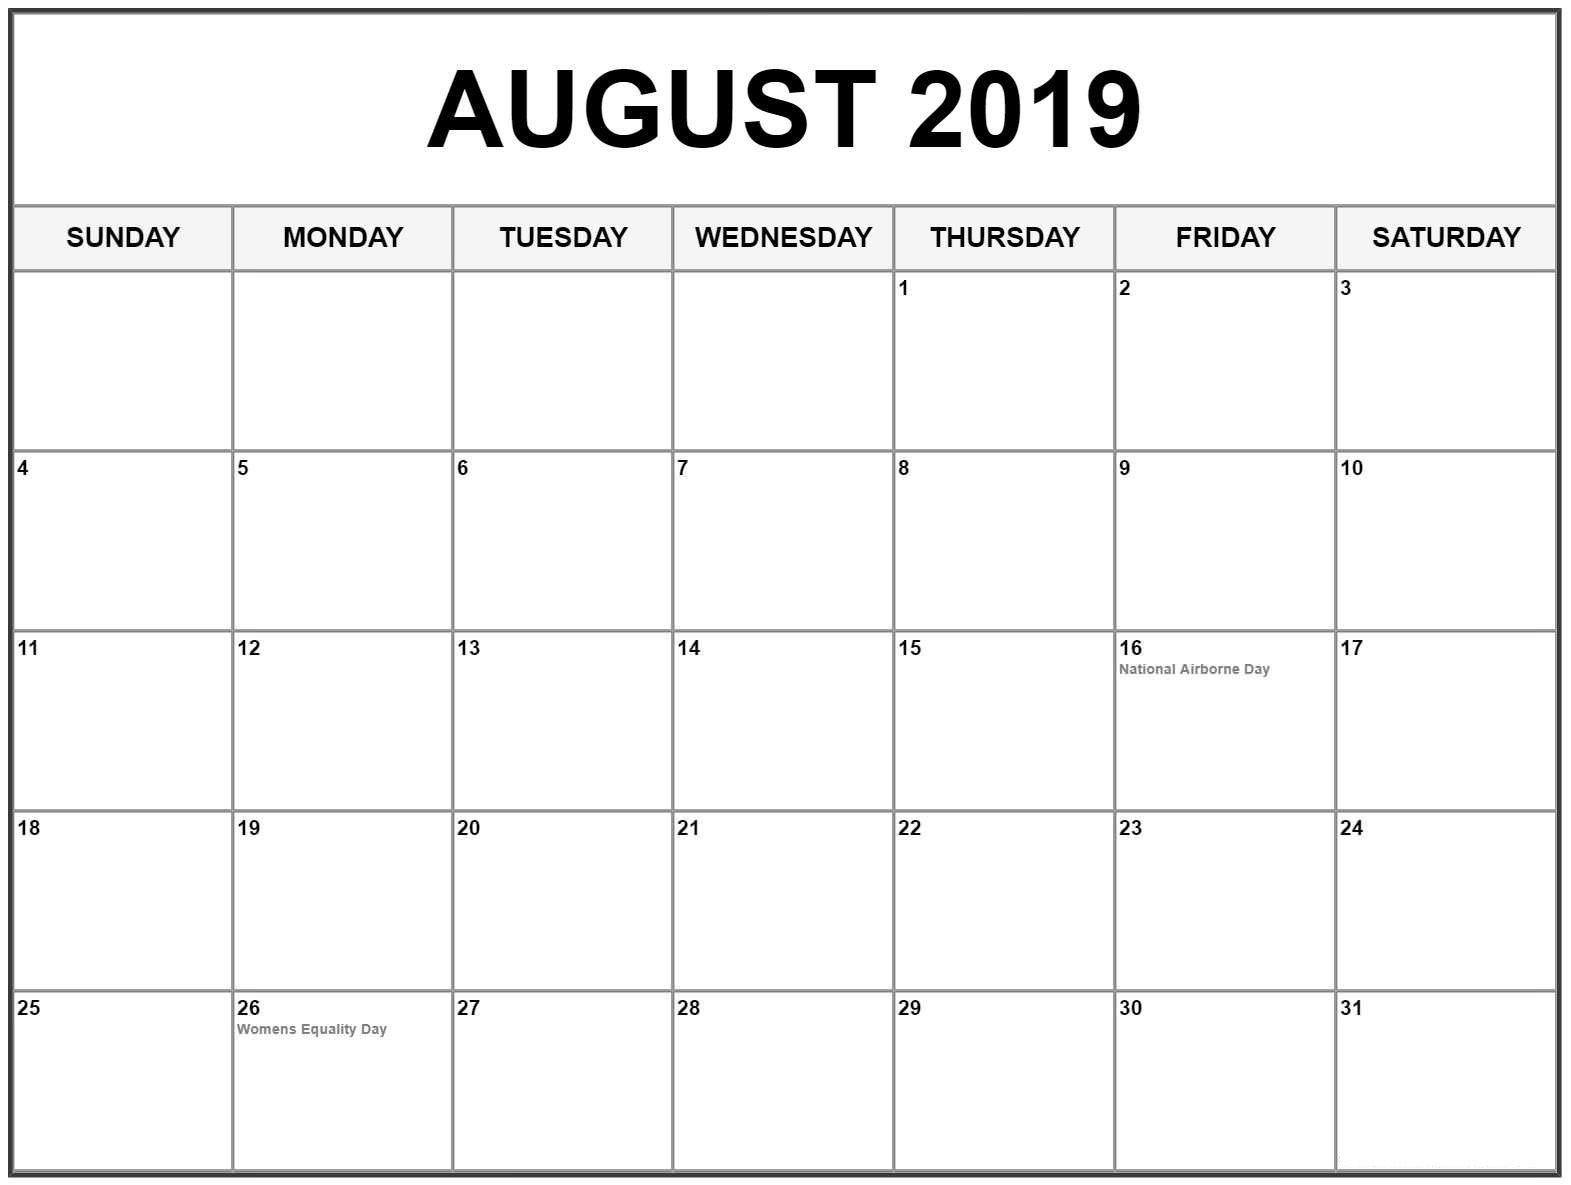 August 2019 Calendar With Holidays Usa, Canada | August